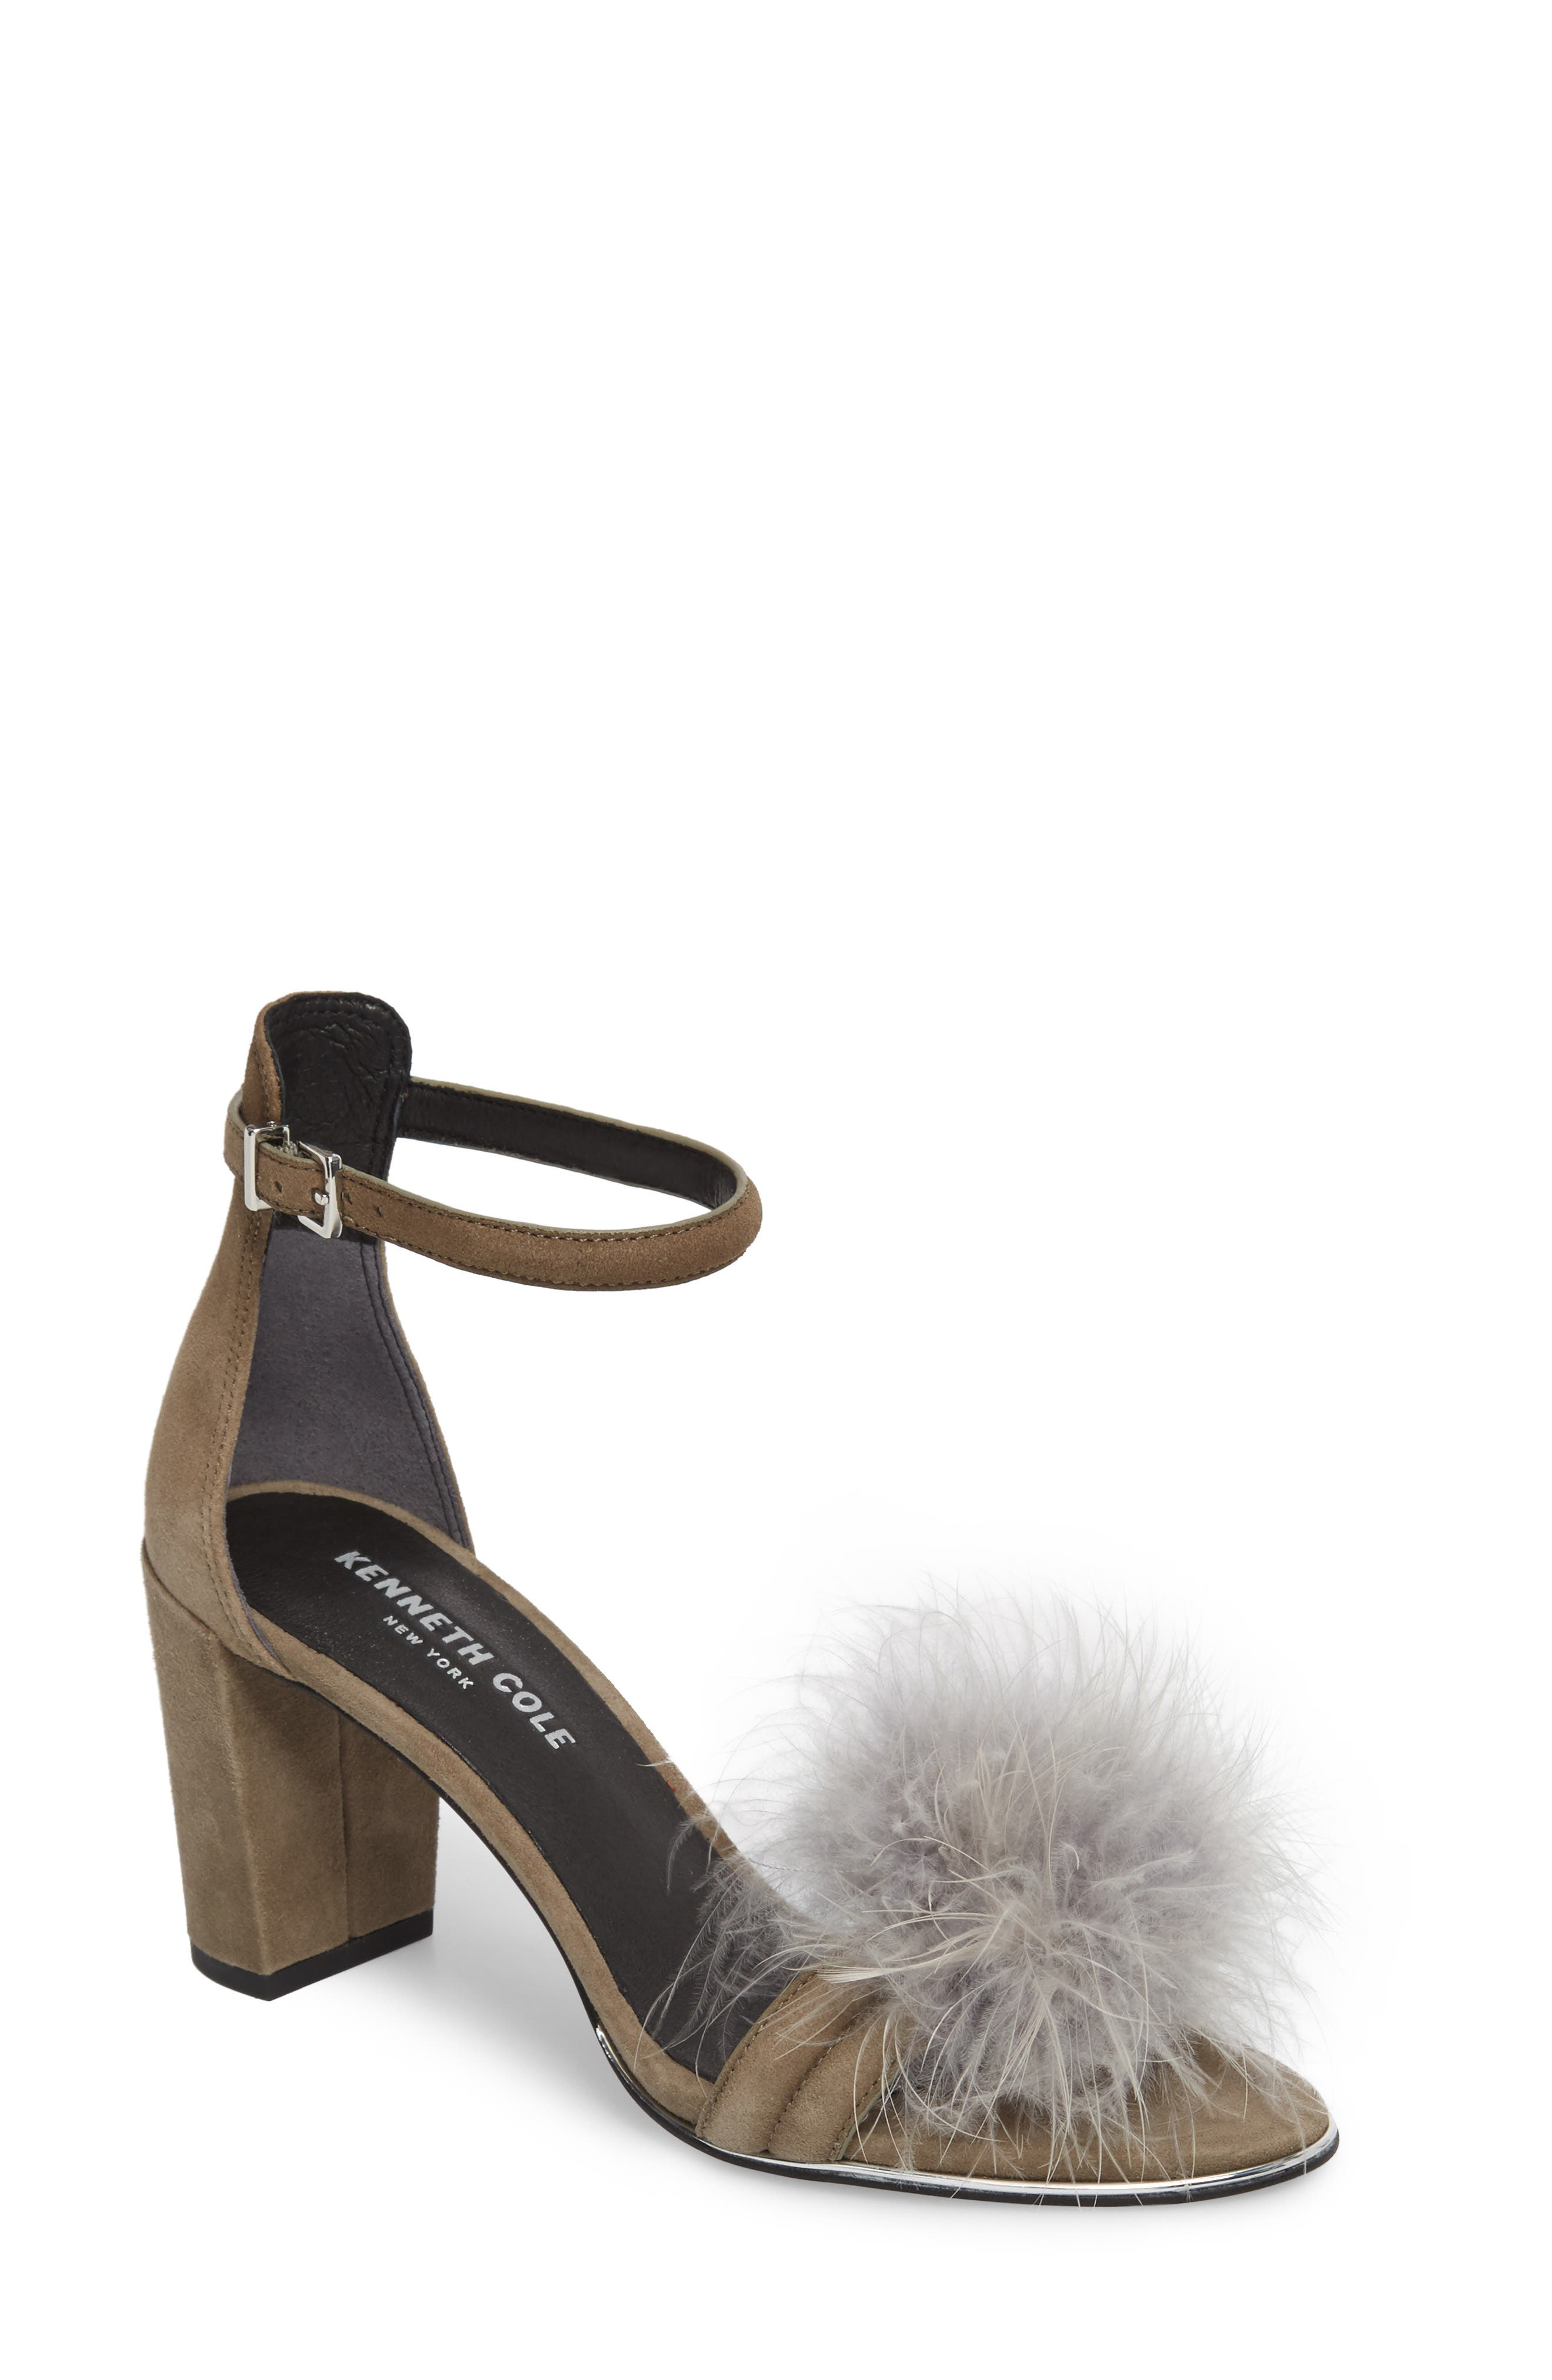 Main Image - Kenneth Cole New York Lex 3 Sandal (Women)